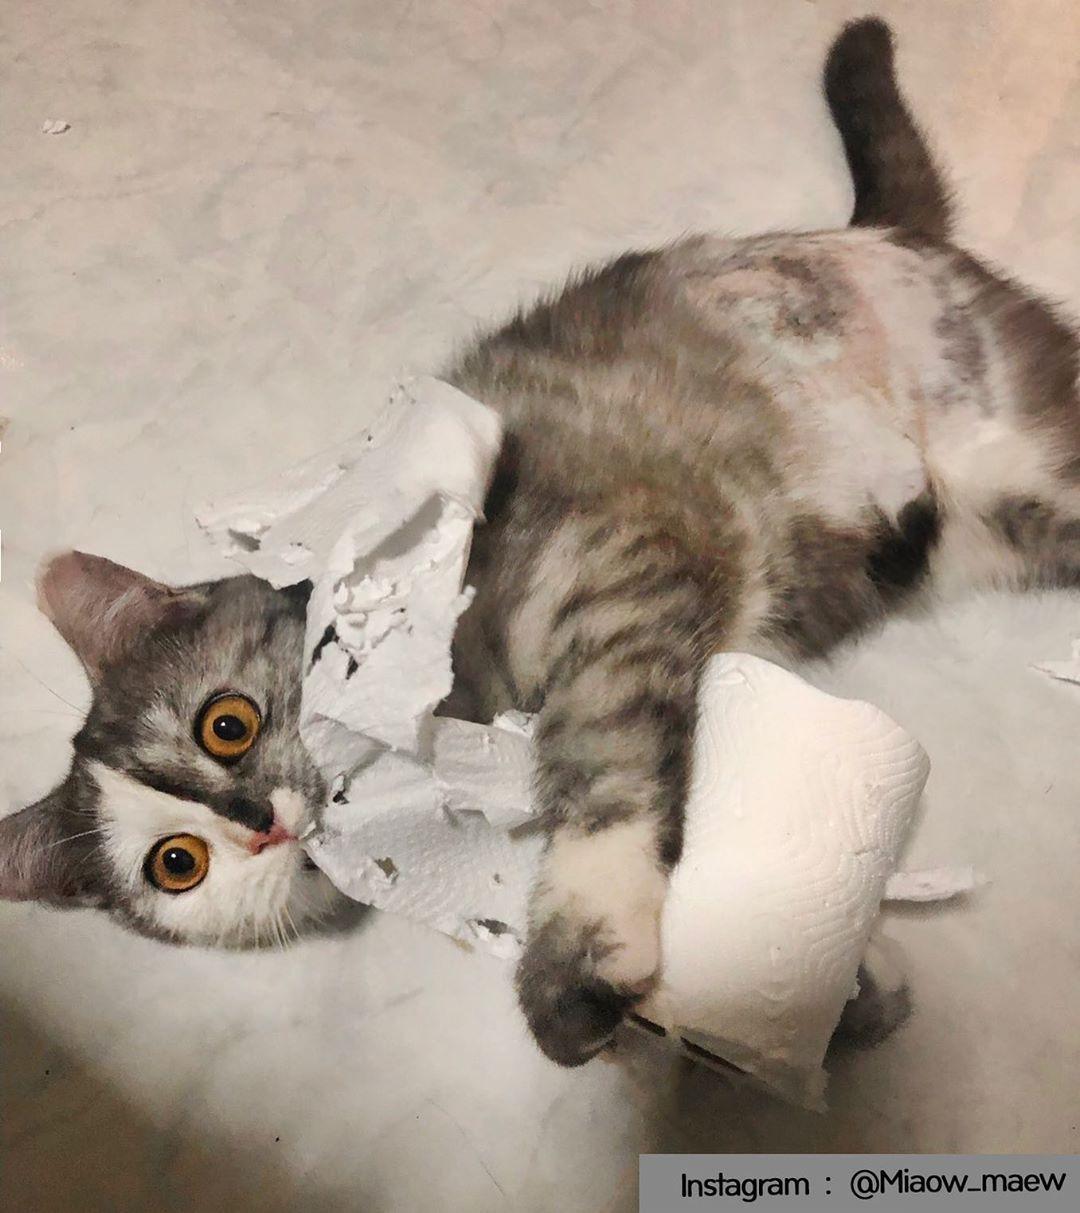 Туалетная бумага оказалась весьма вкусным прдуктом